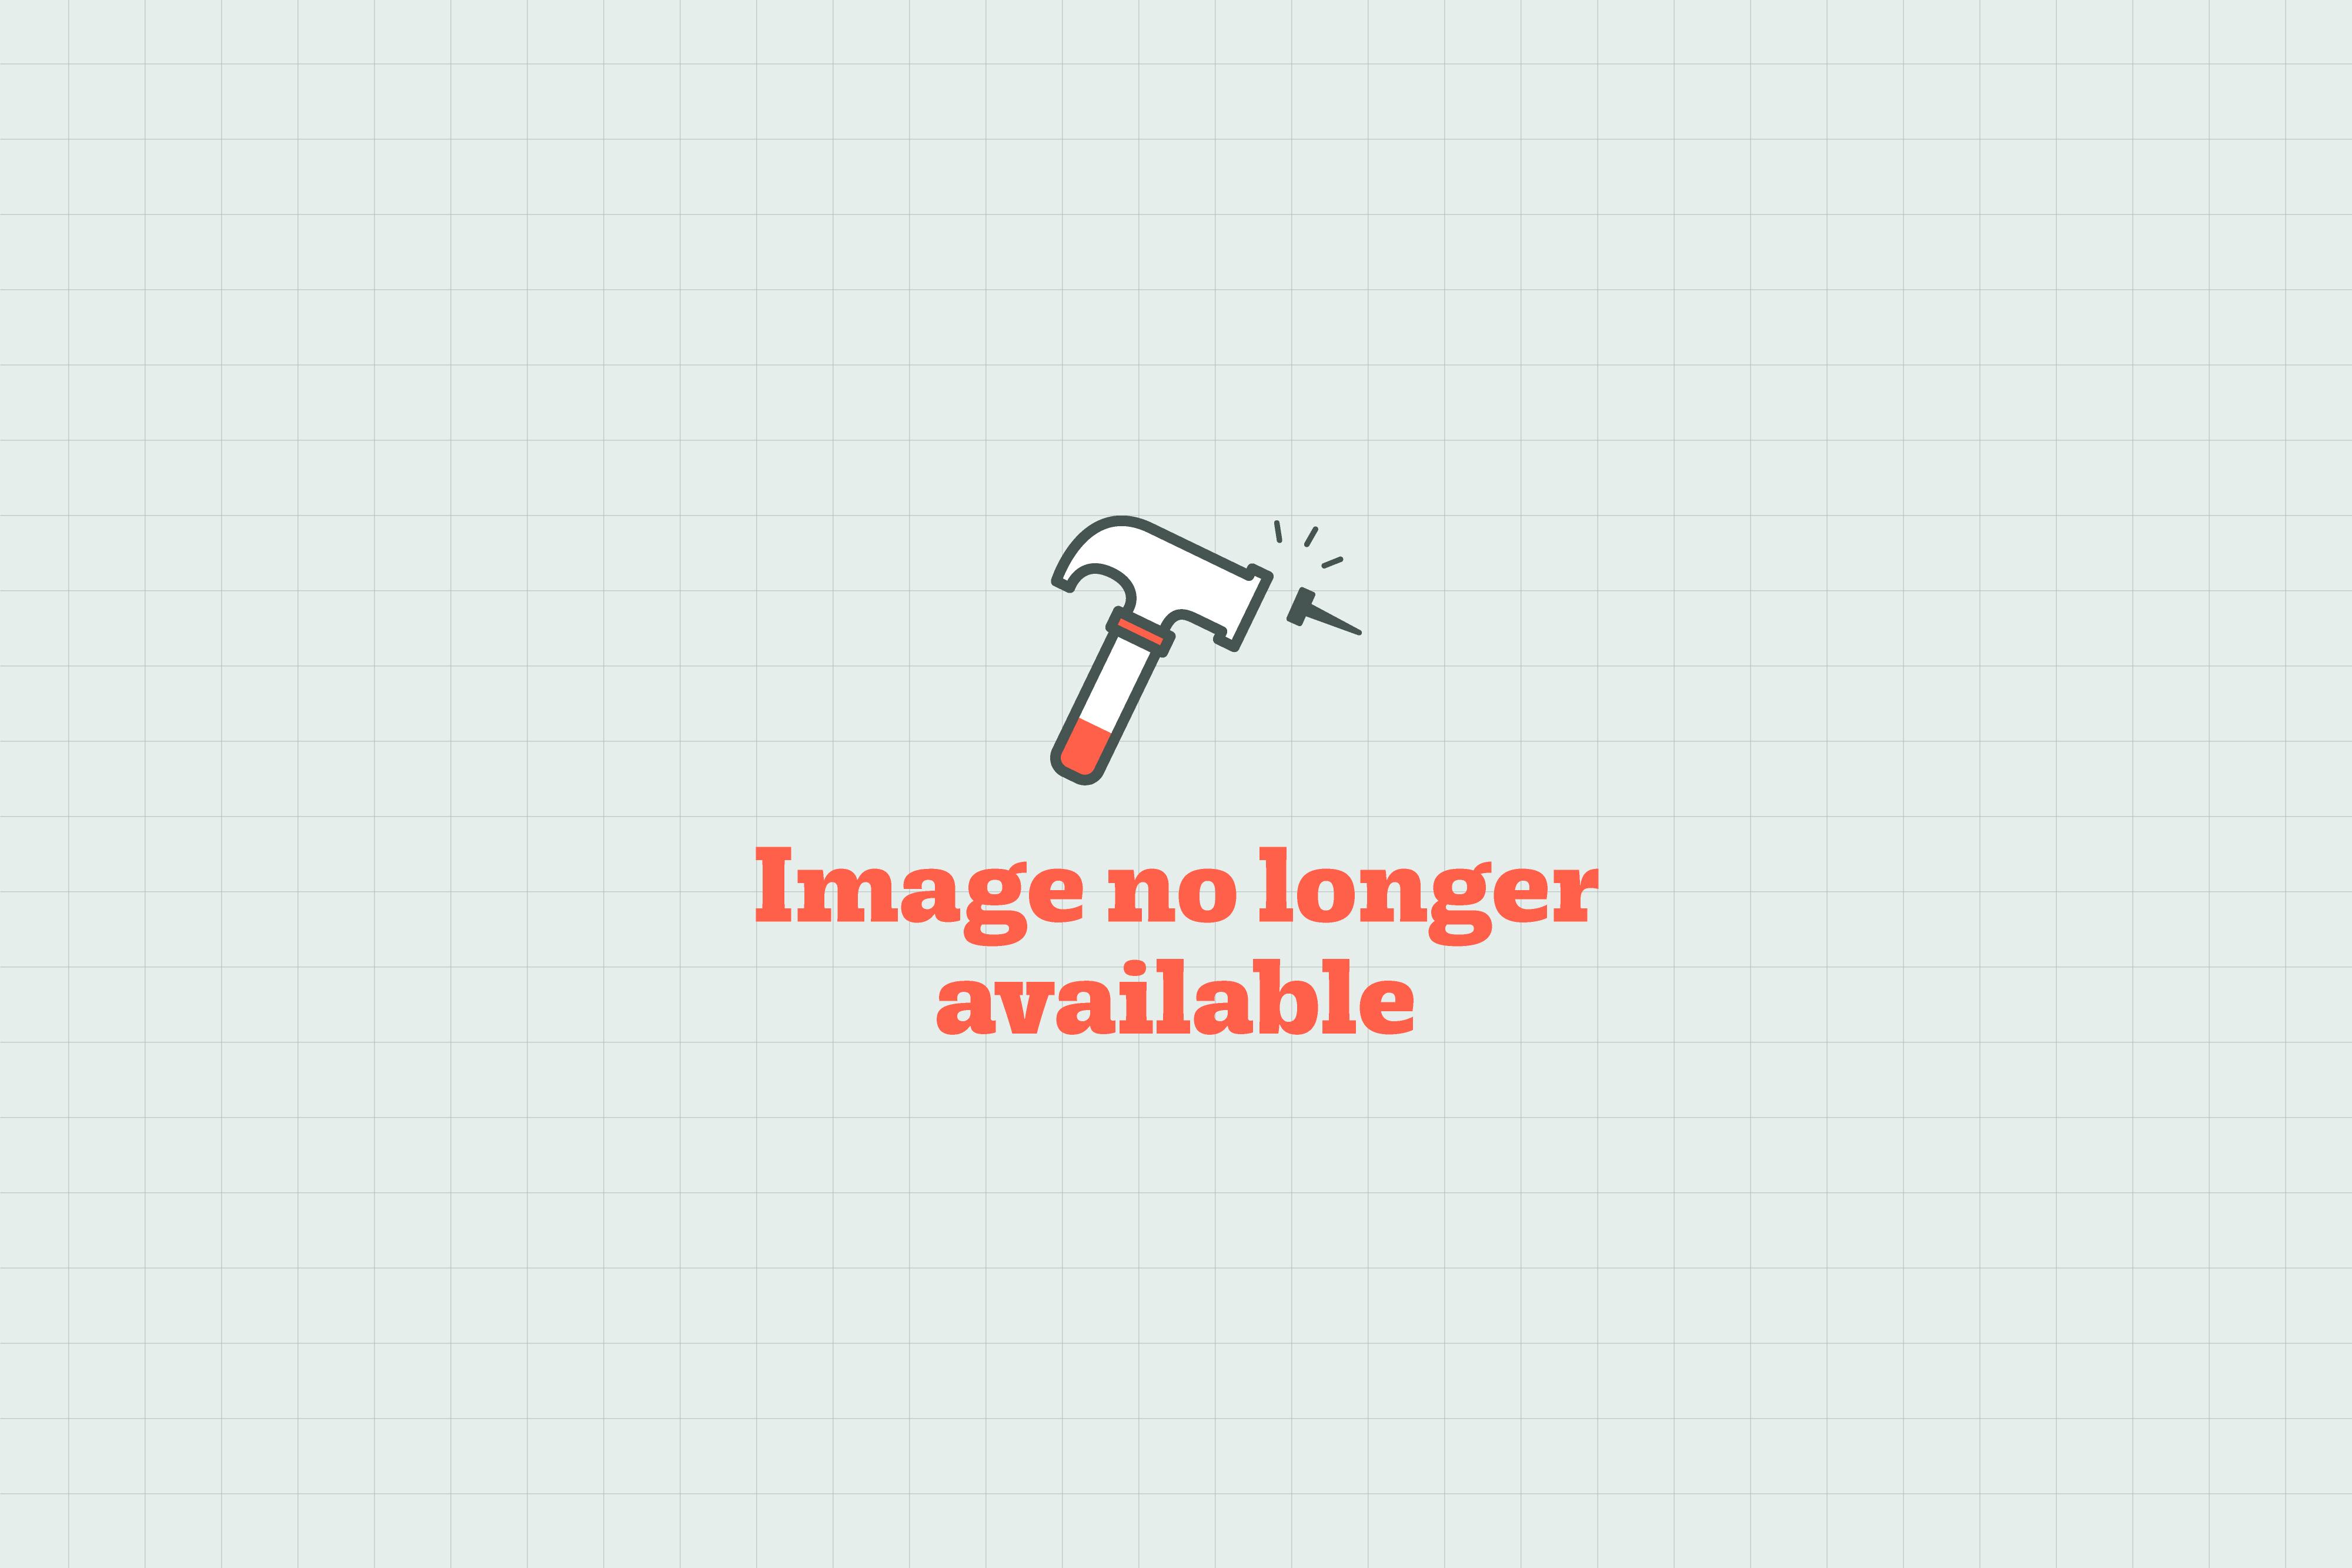 descargar keygen autocad 2014 gratis